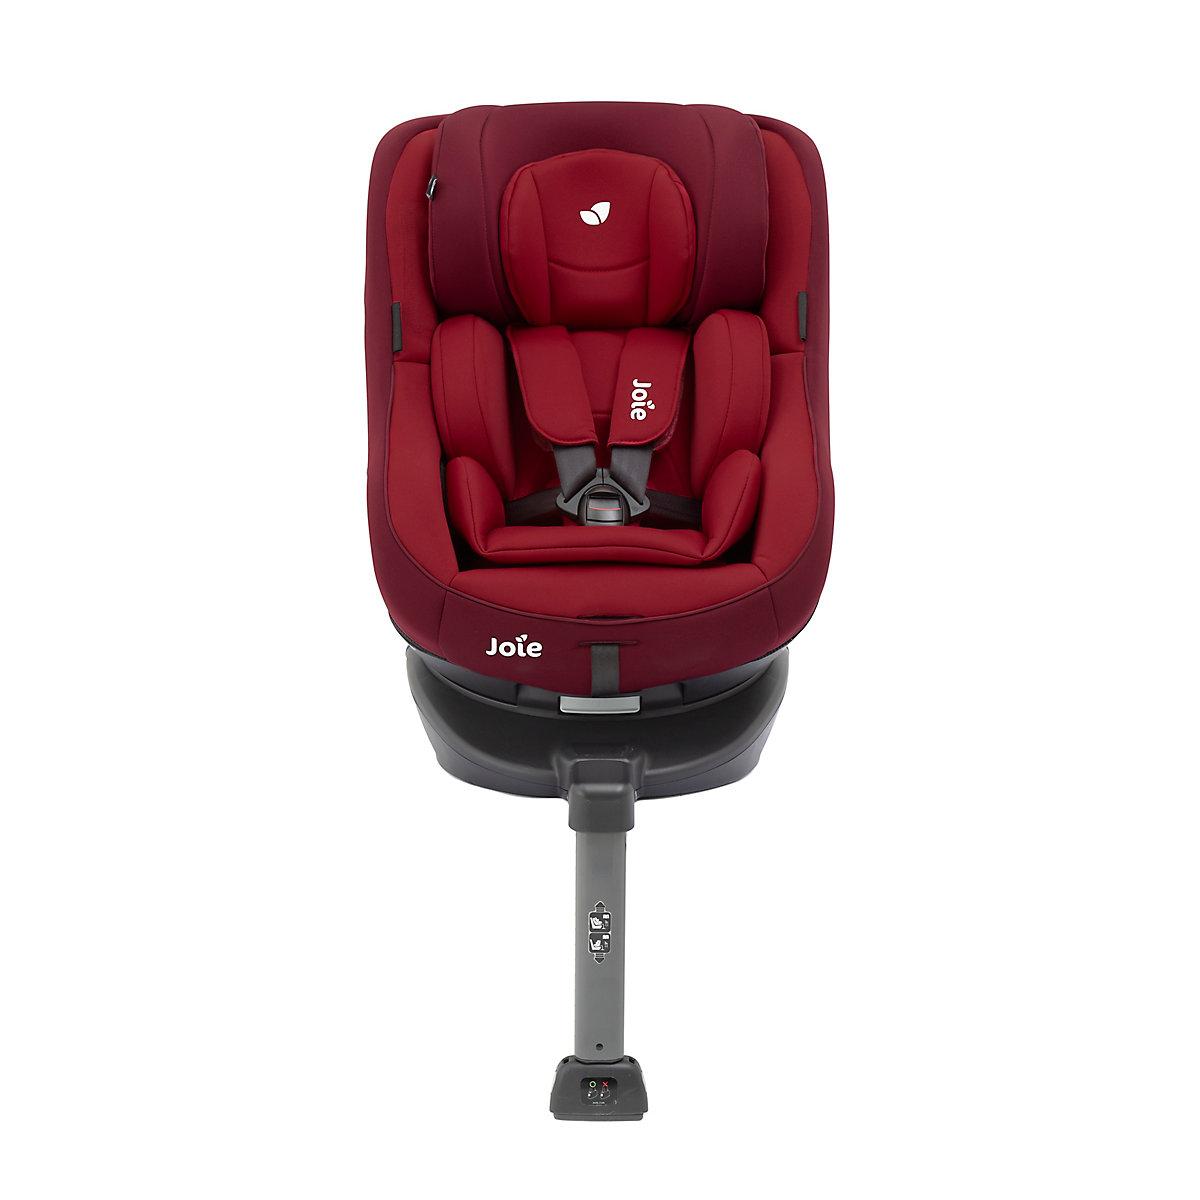 Joie Spin 360 Car Seat – Merlot